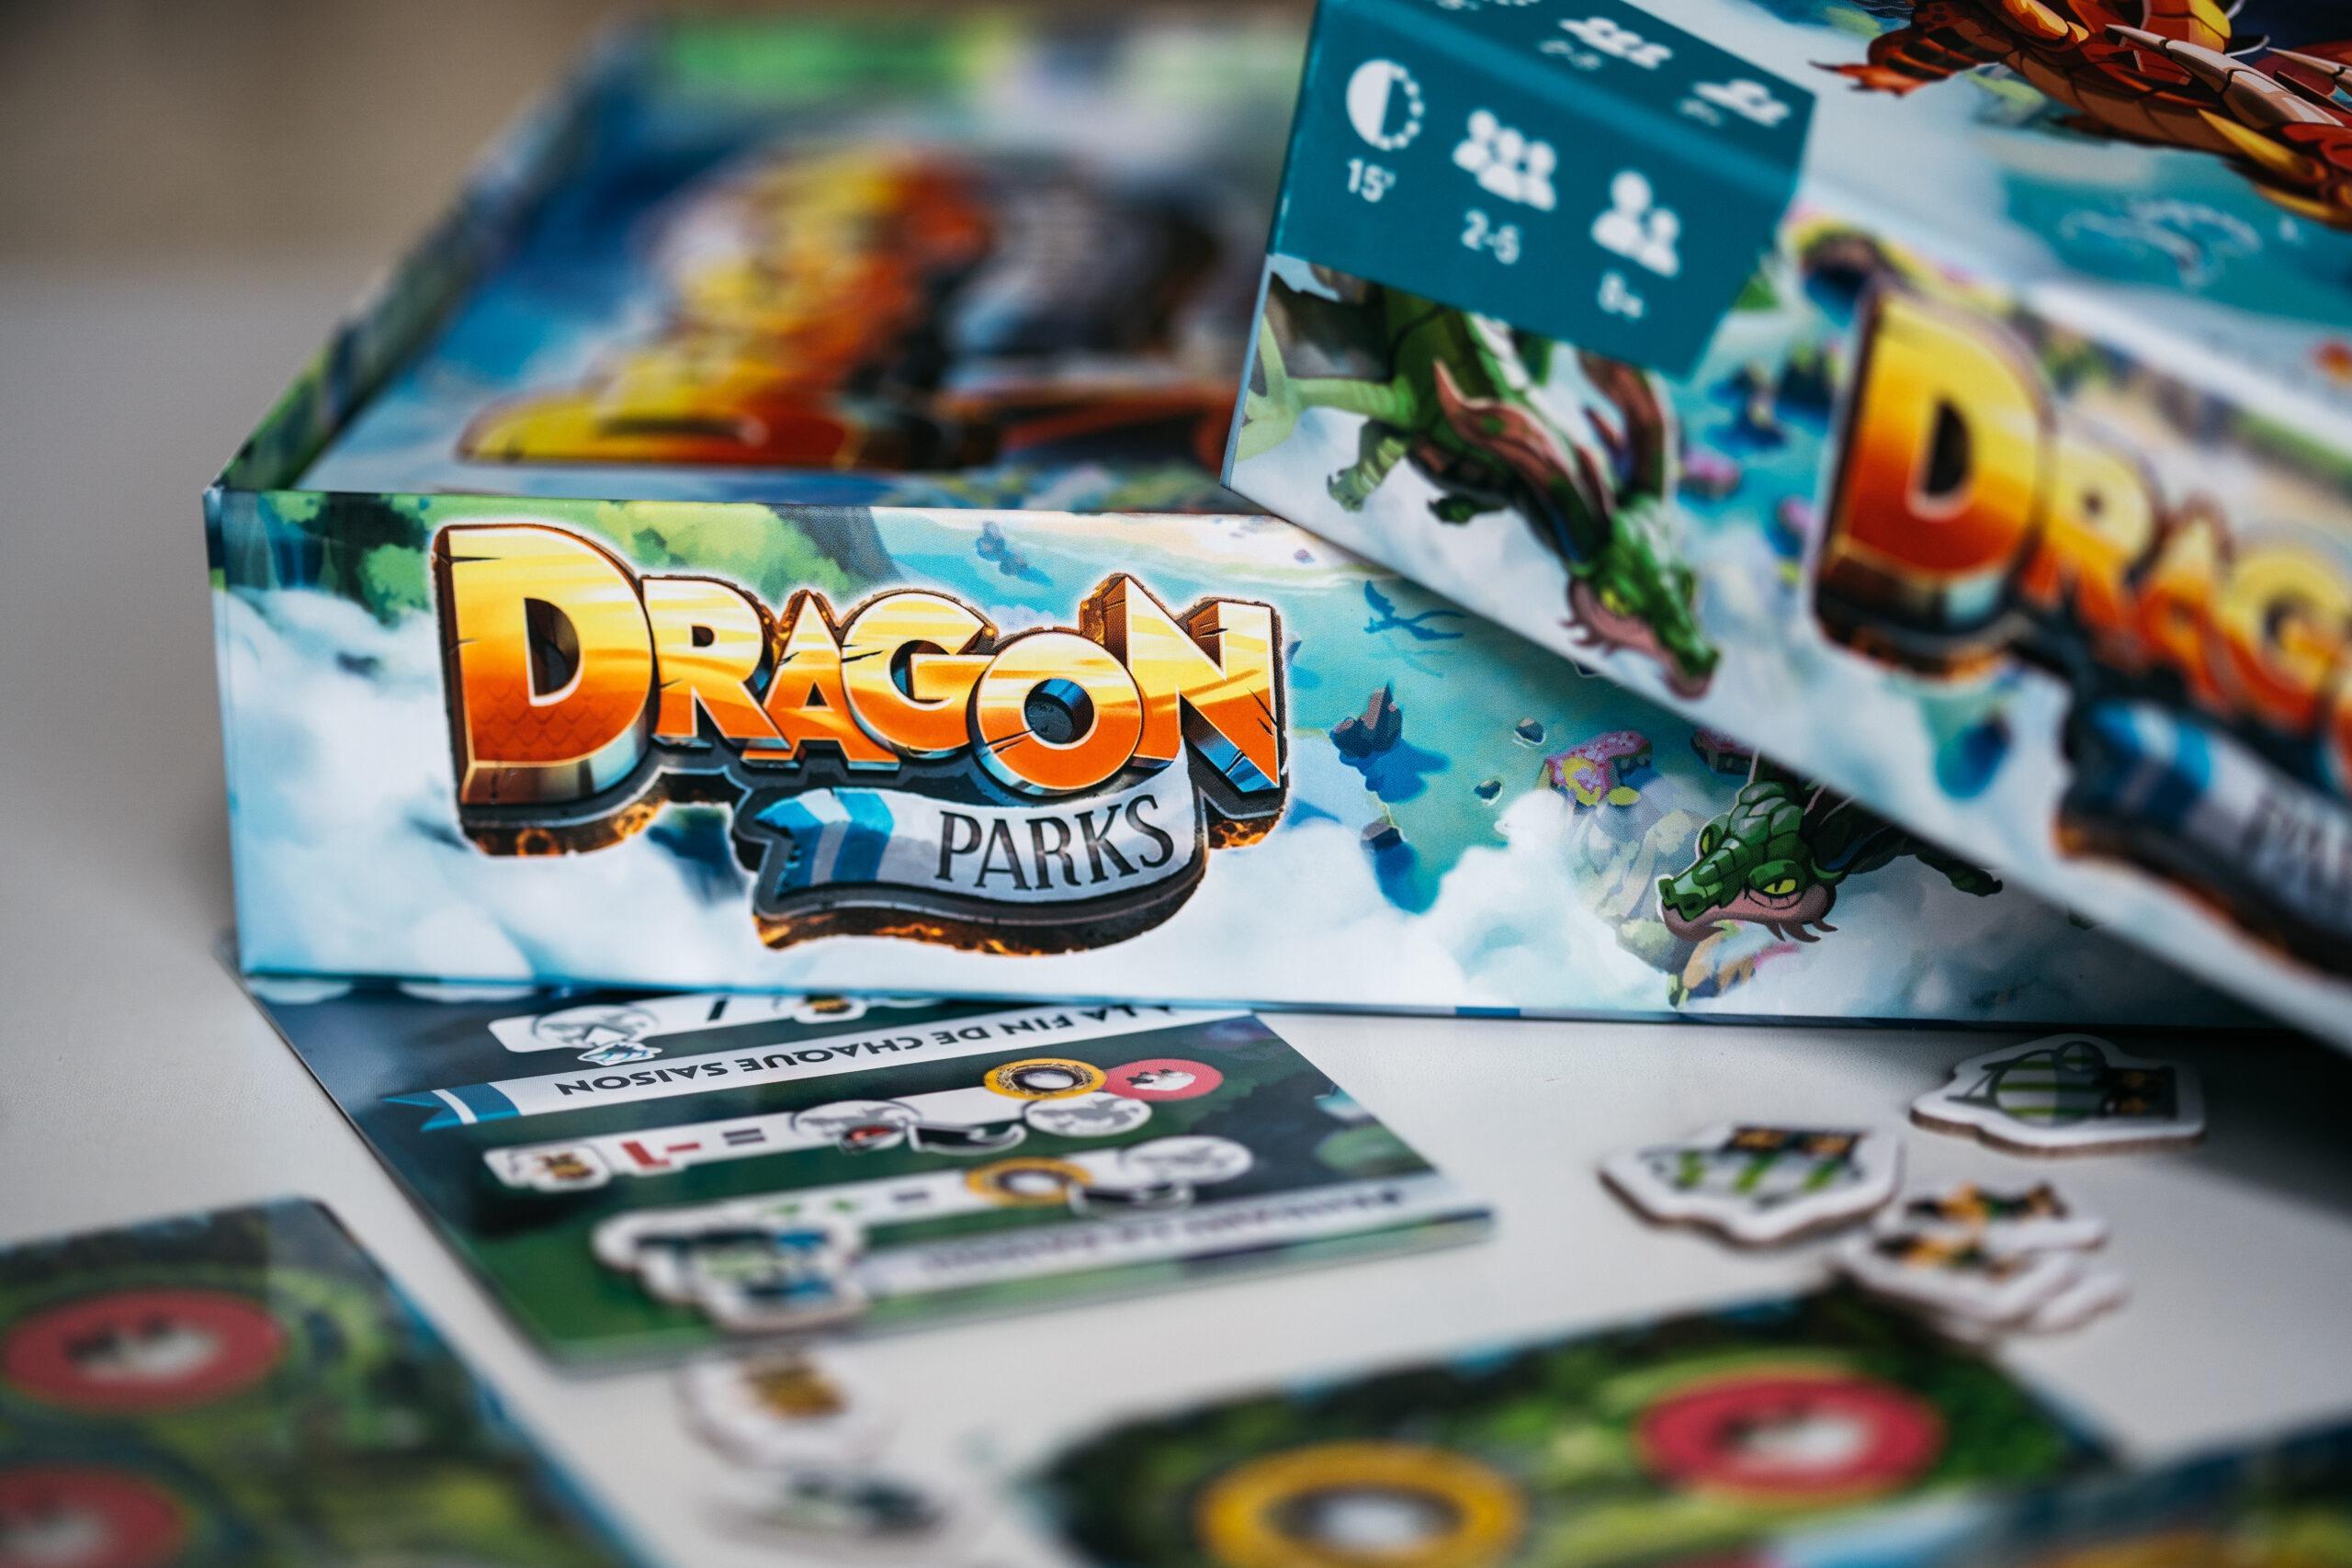 Dragon parks ankama jeu de société